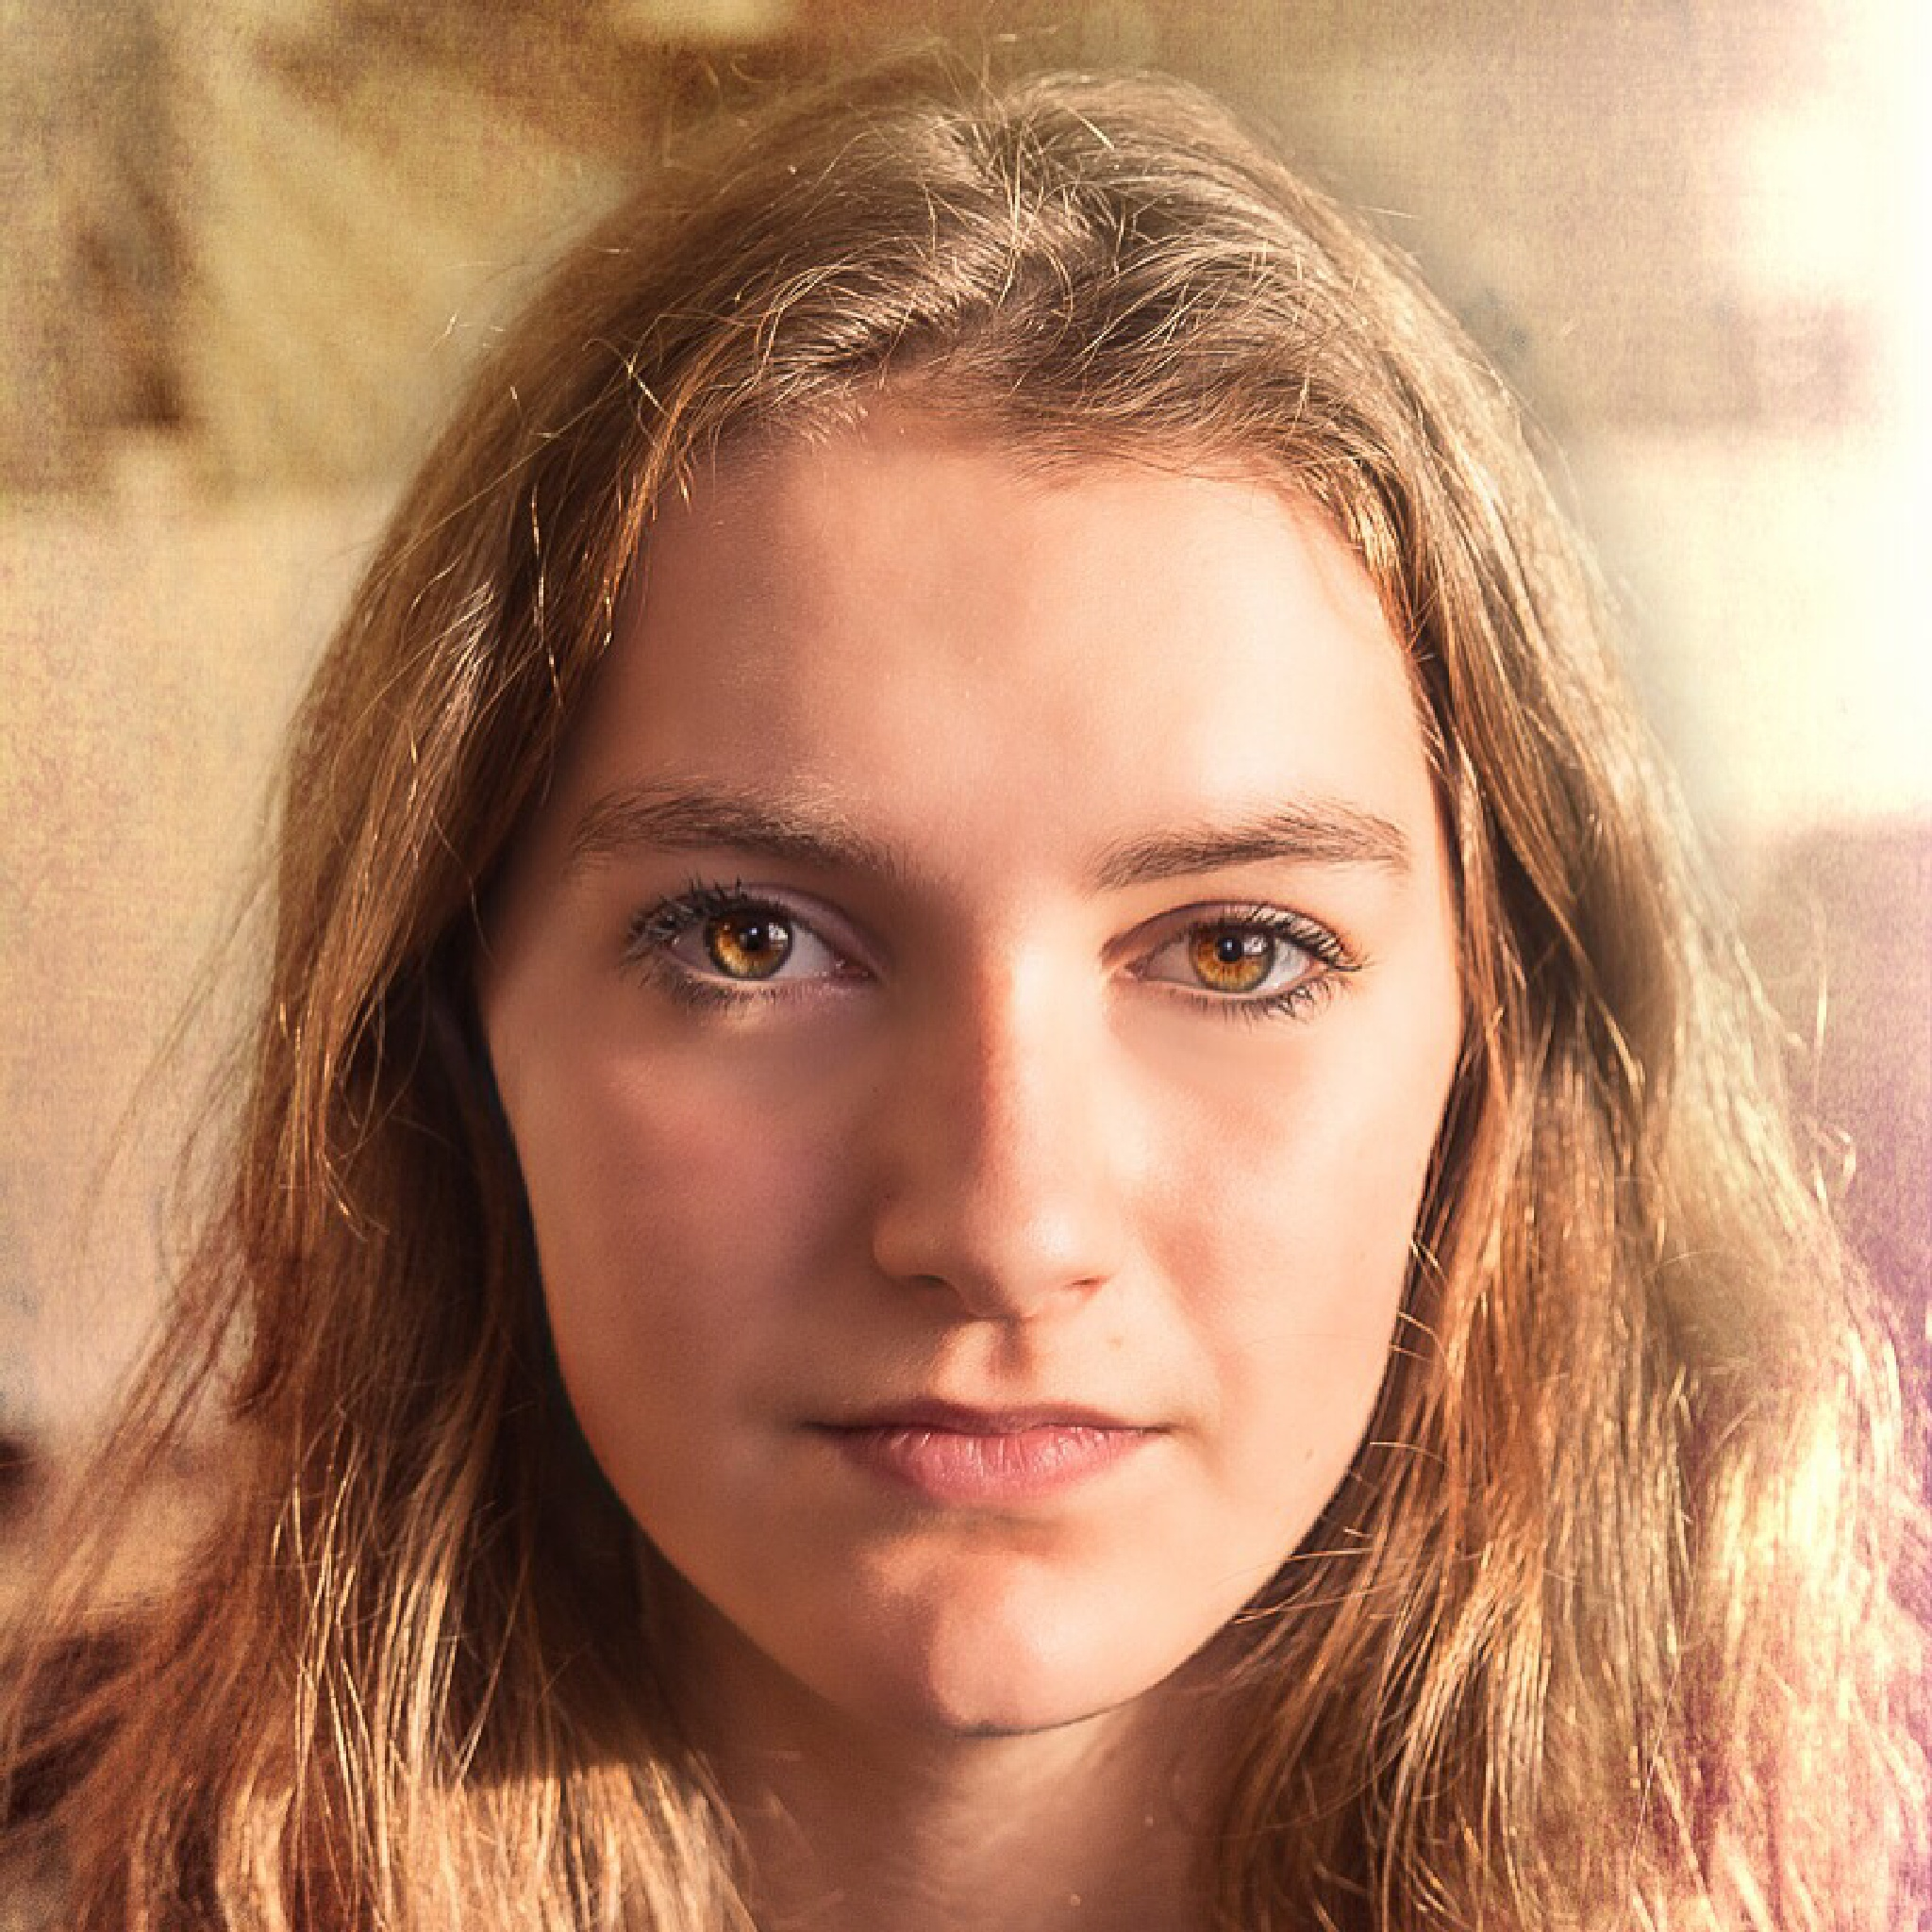 Olav's 14 year old daughter Britt by Doc List